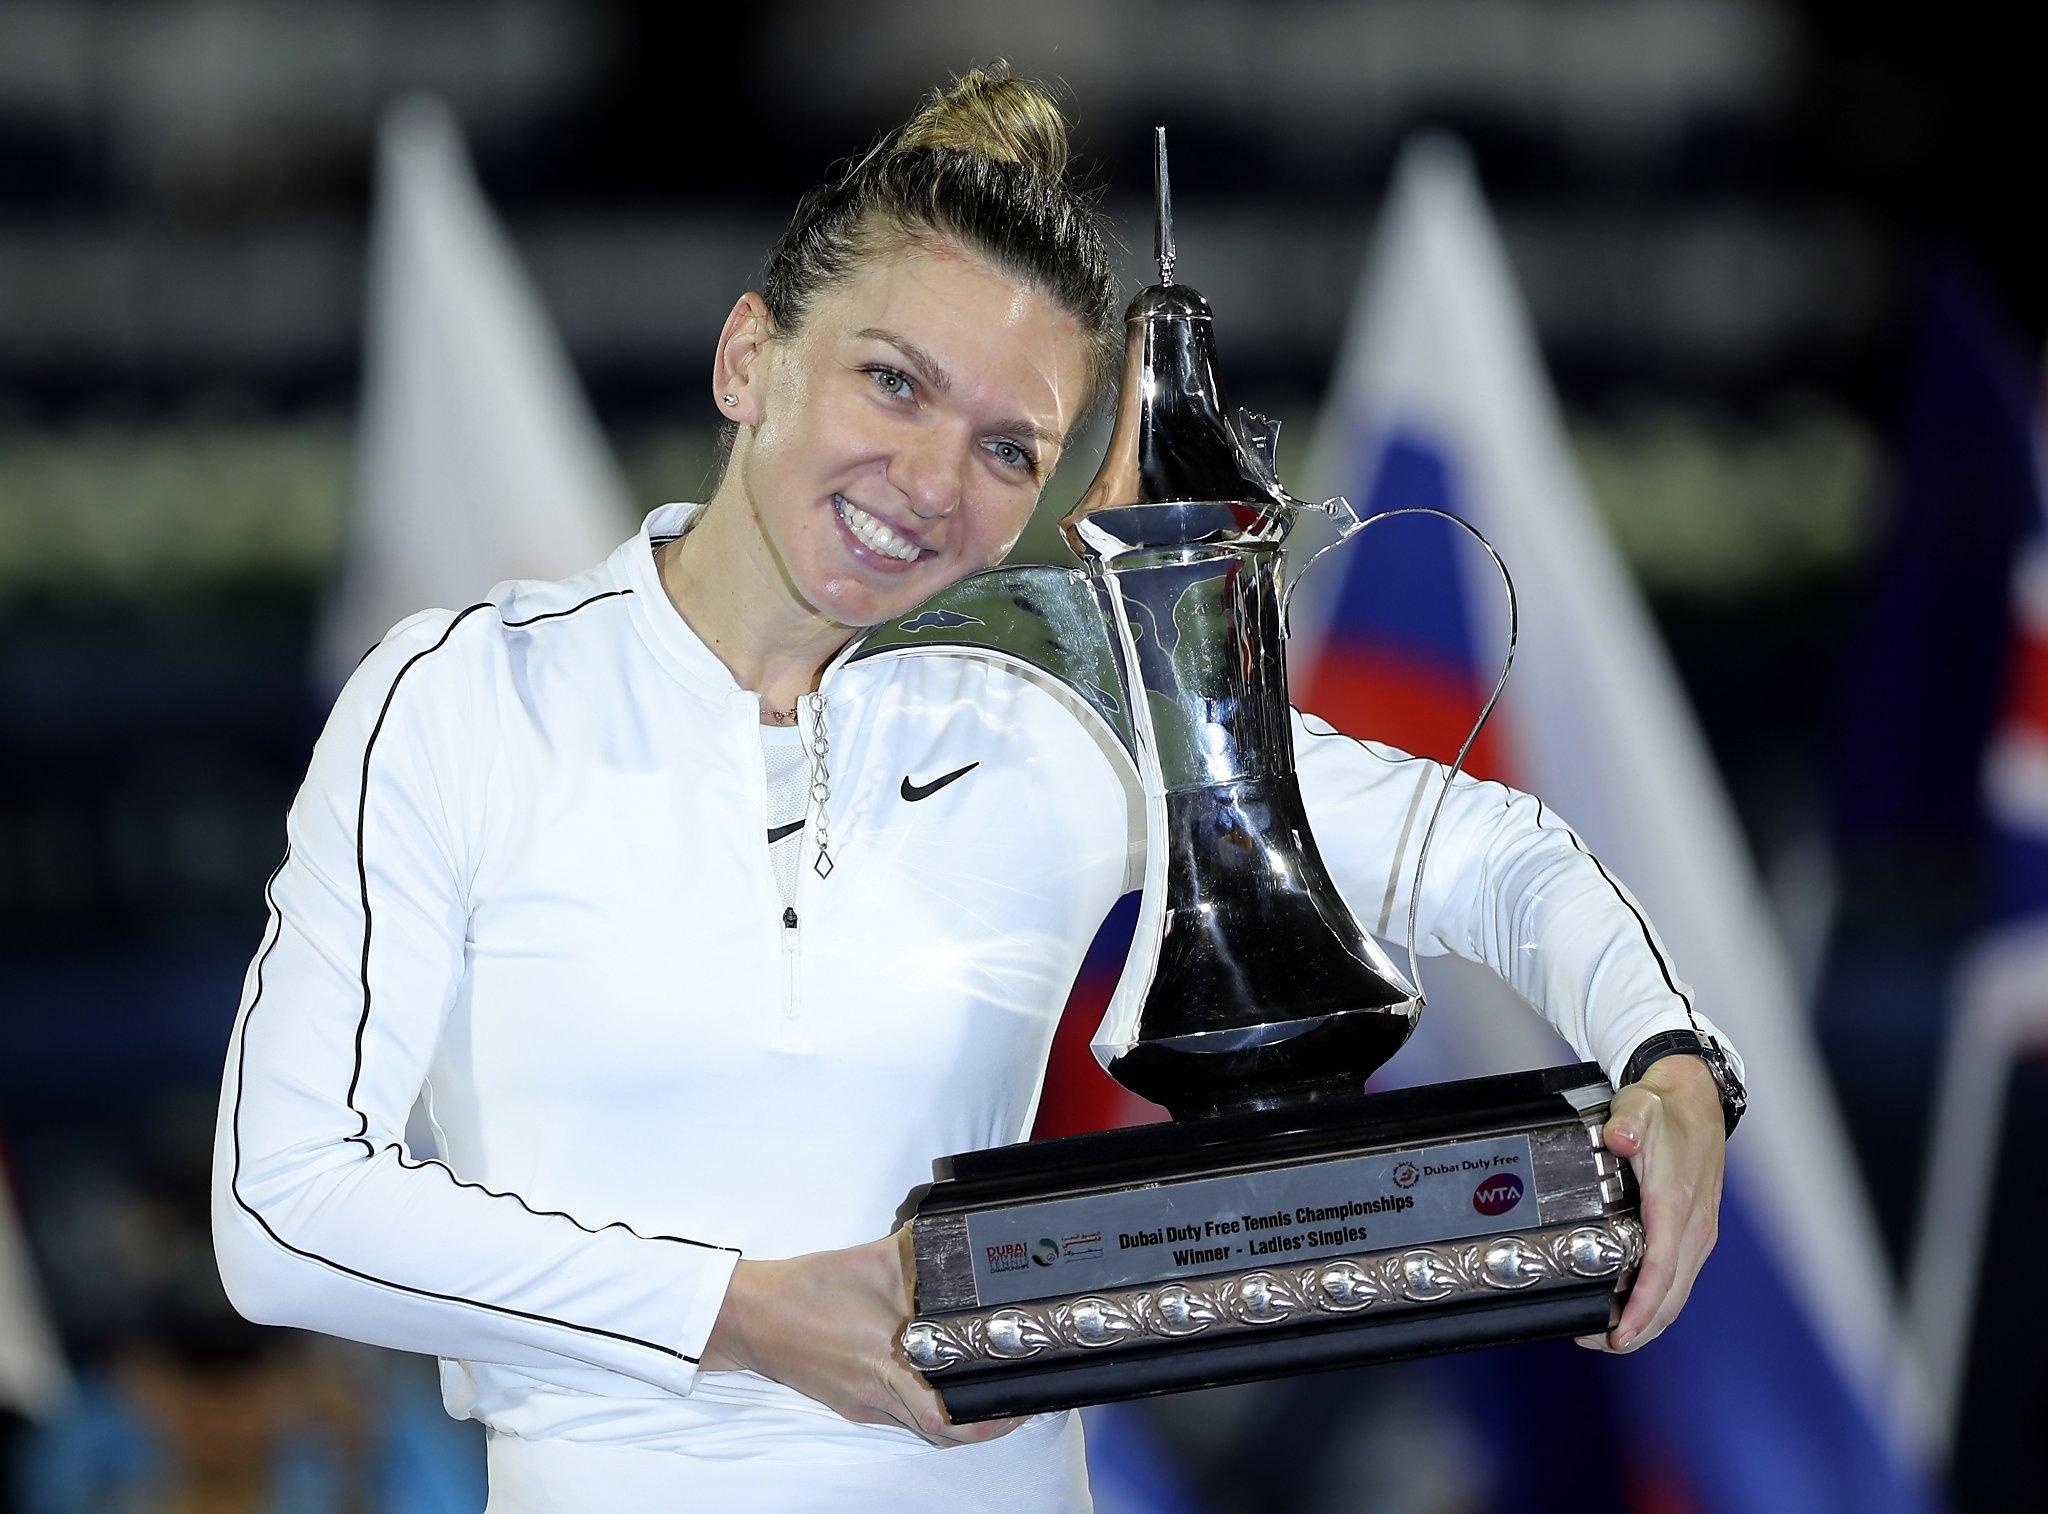 Simona Halep wins Dubai tiebreaker to secure 20th singles title